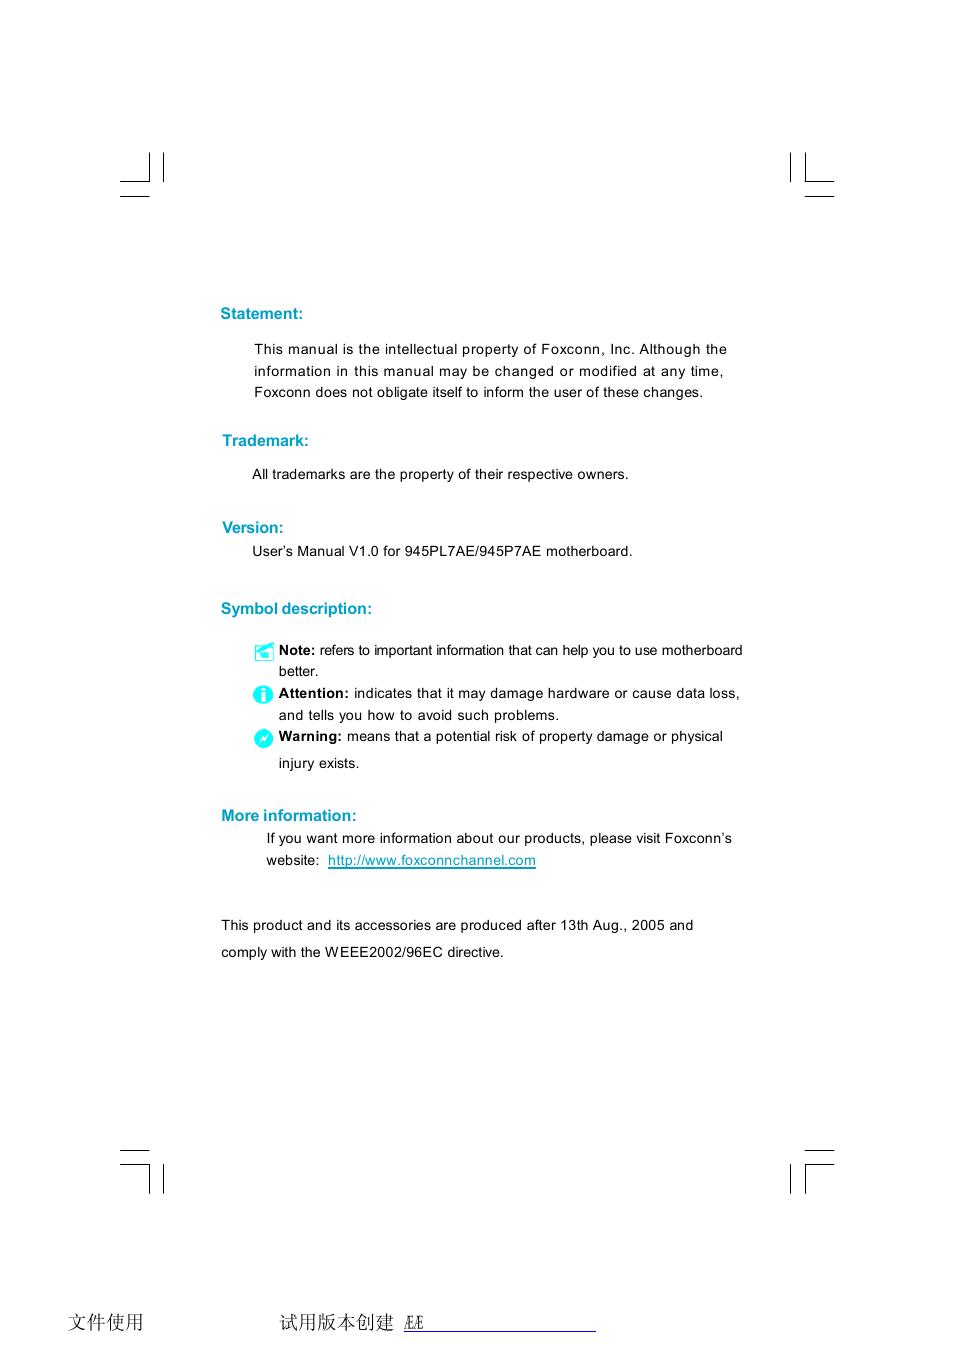 Foxconn 945pl7ae инструкция